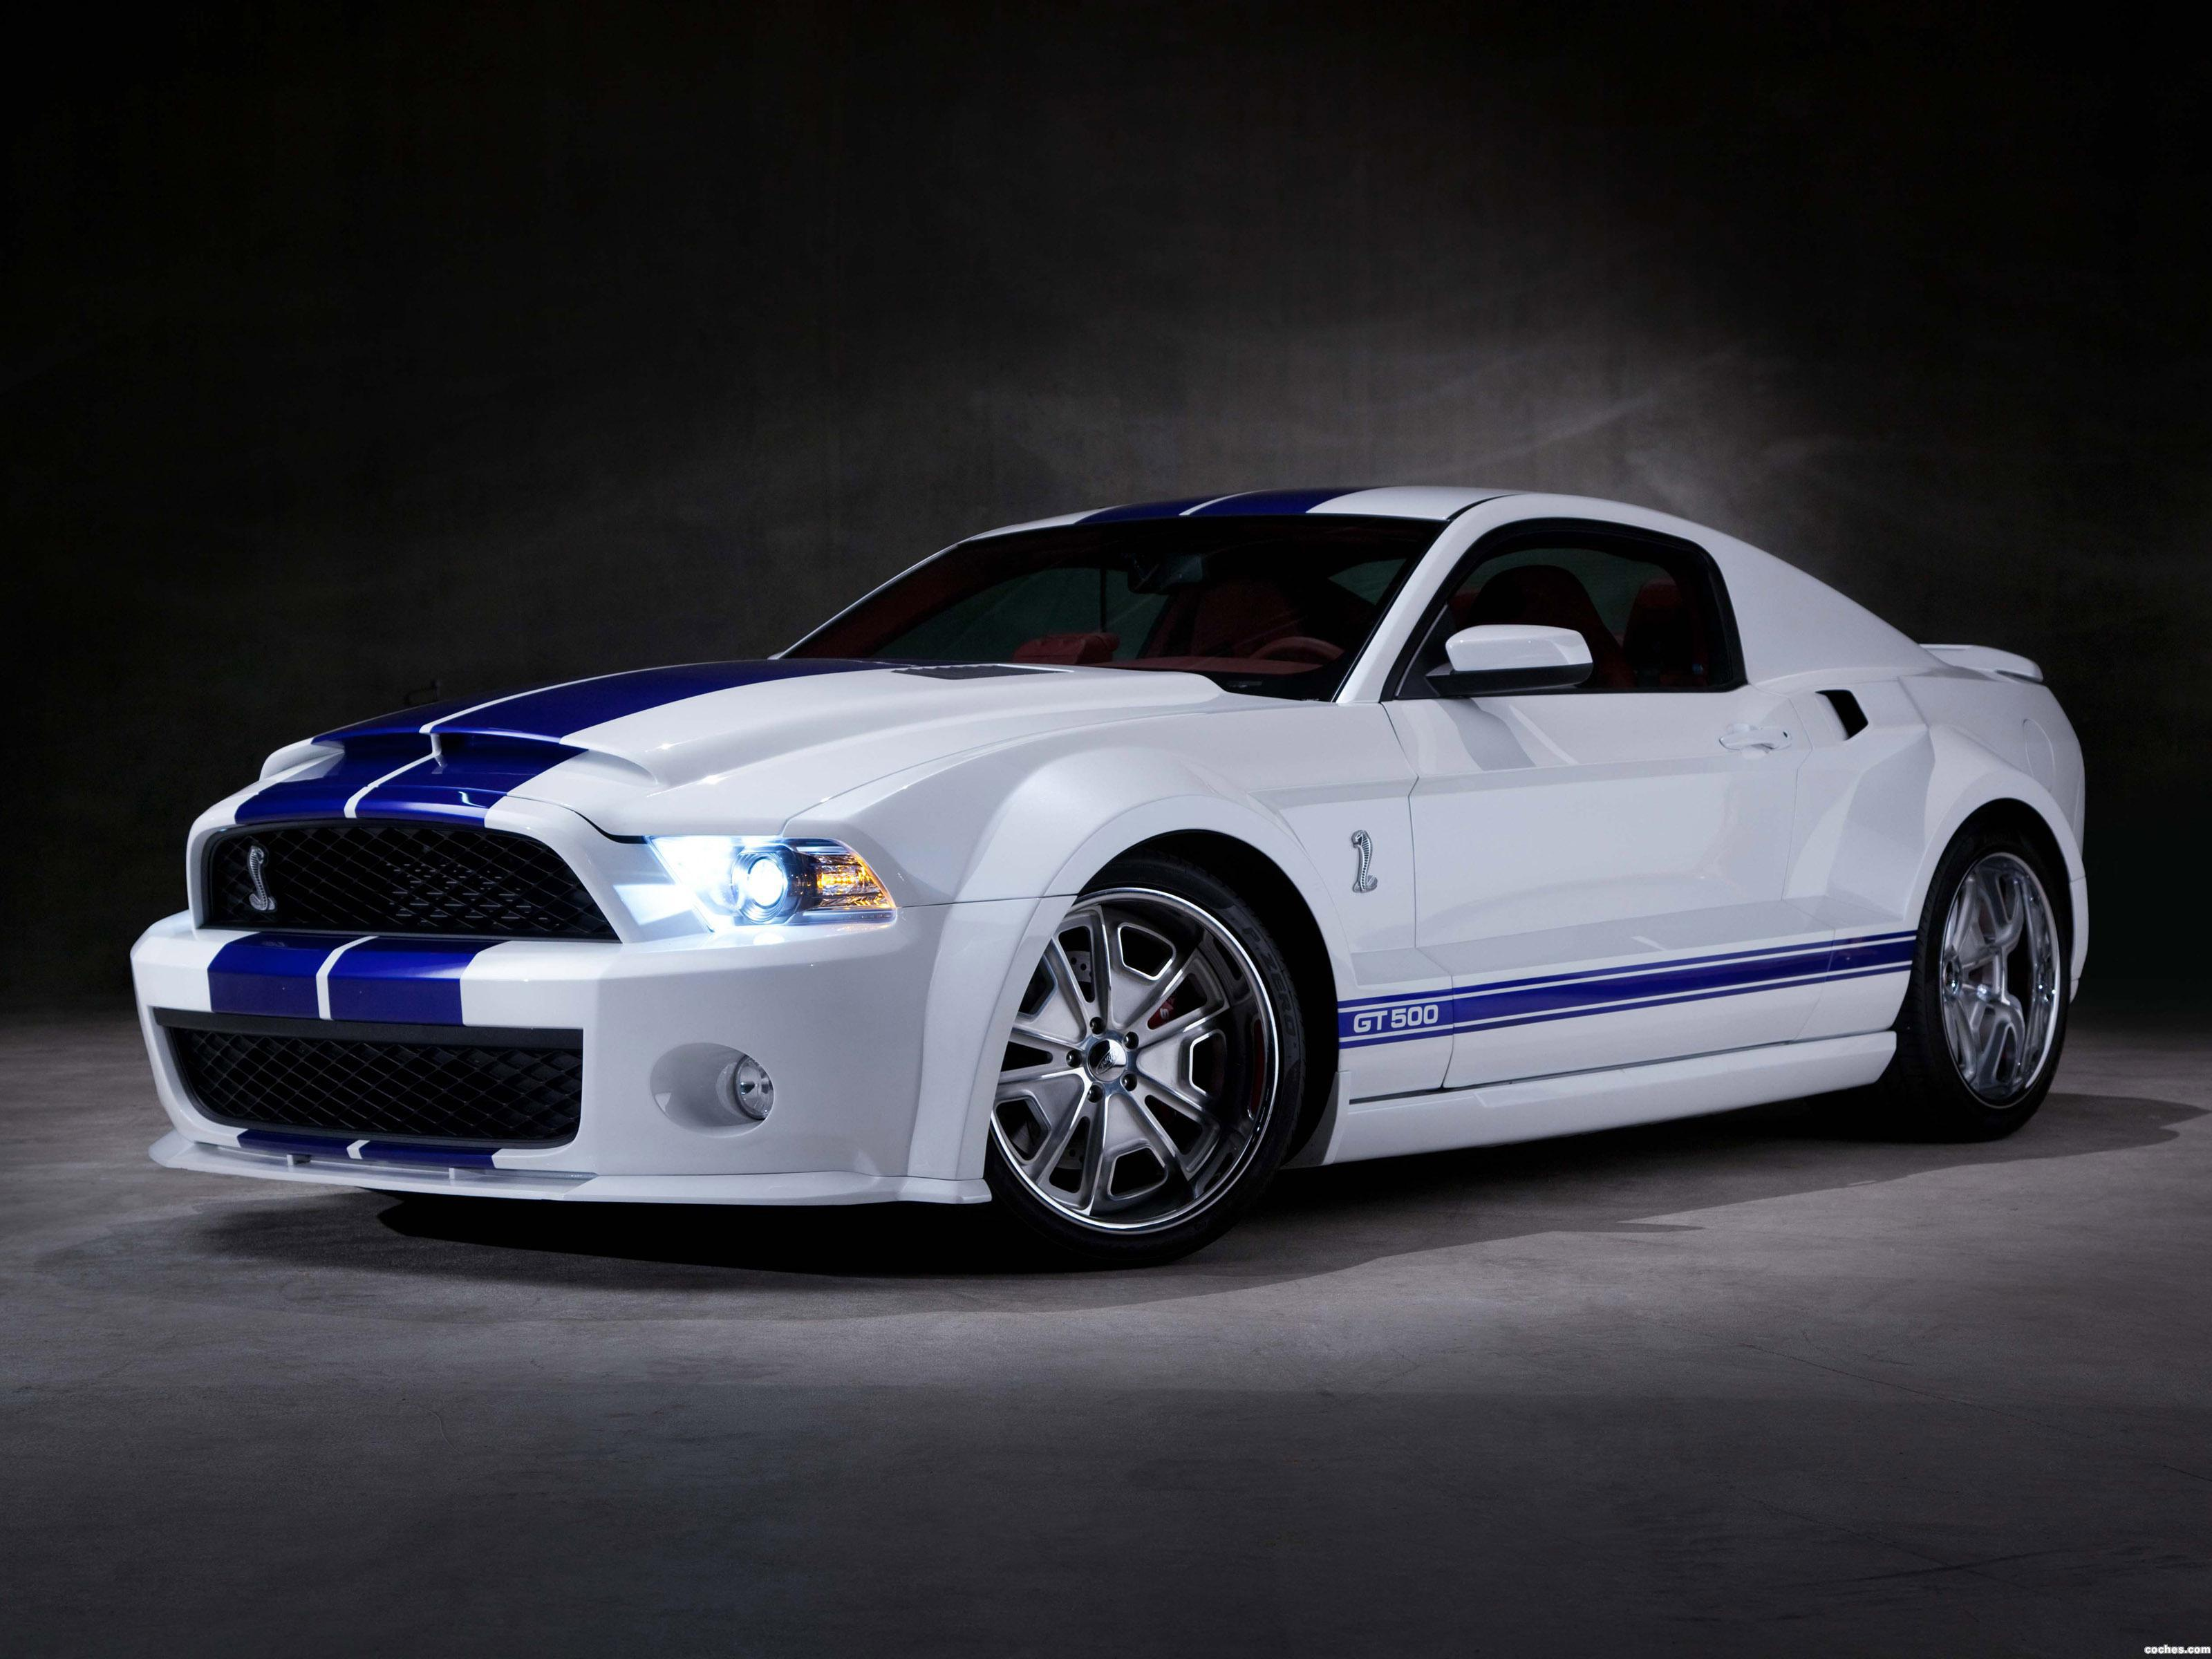 Foto 0 de Shelby Ford Mustang GT500 SVT Wide Body Galpin Auto Sport 2012